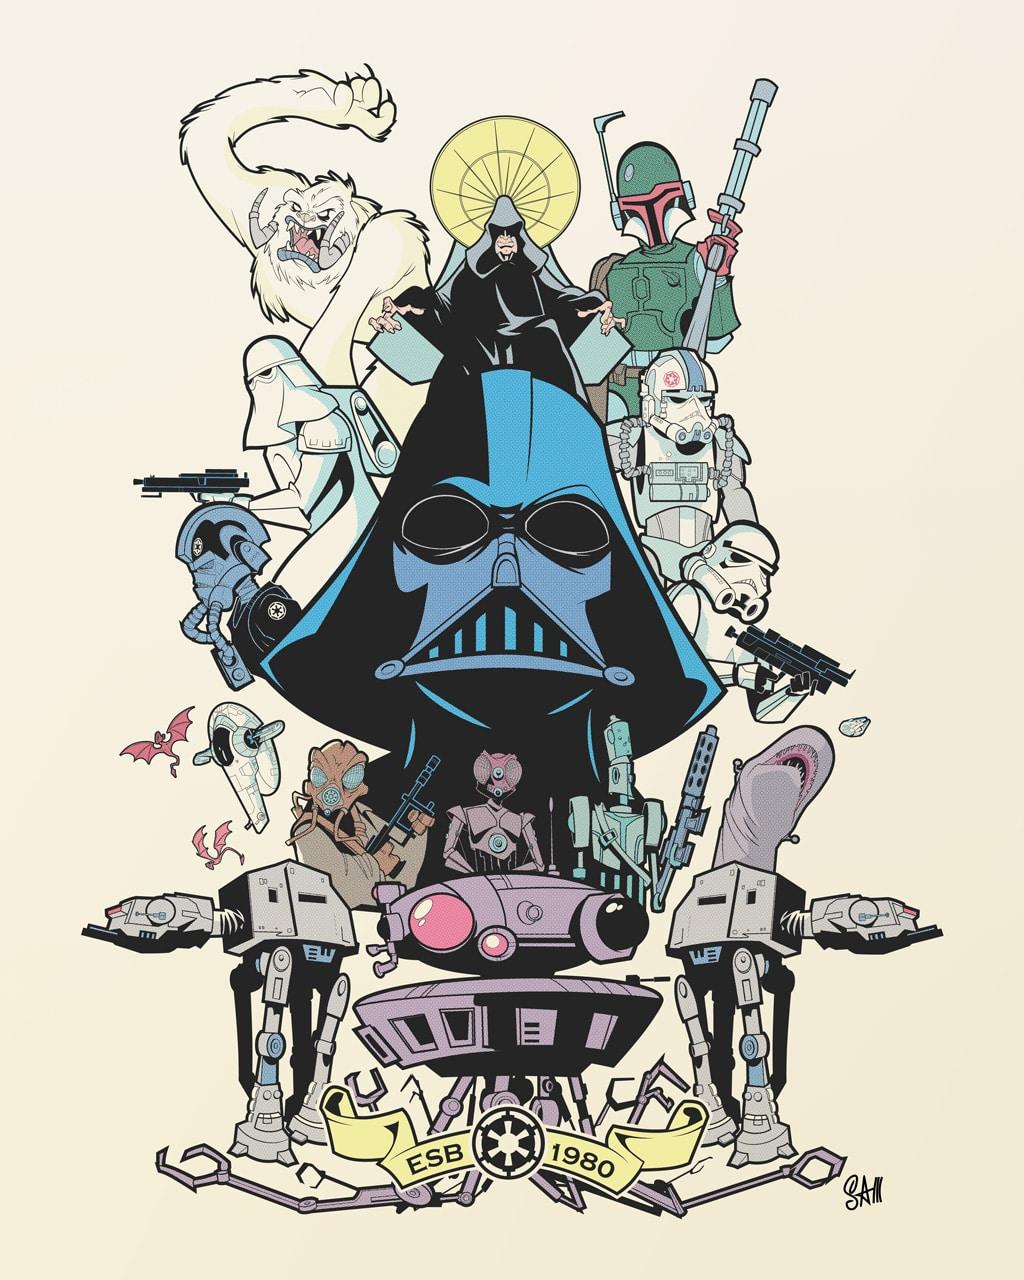 Retro Cartoons: Star Wars And Indiana Jones Awesomeness!